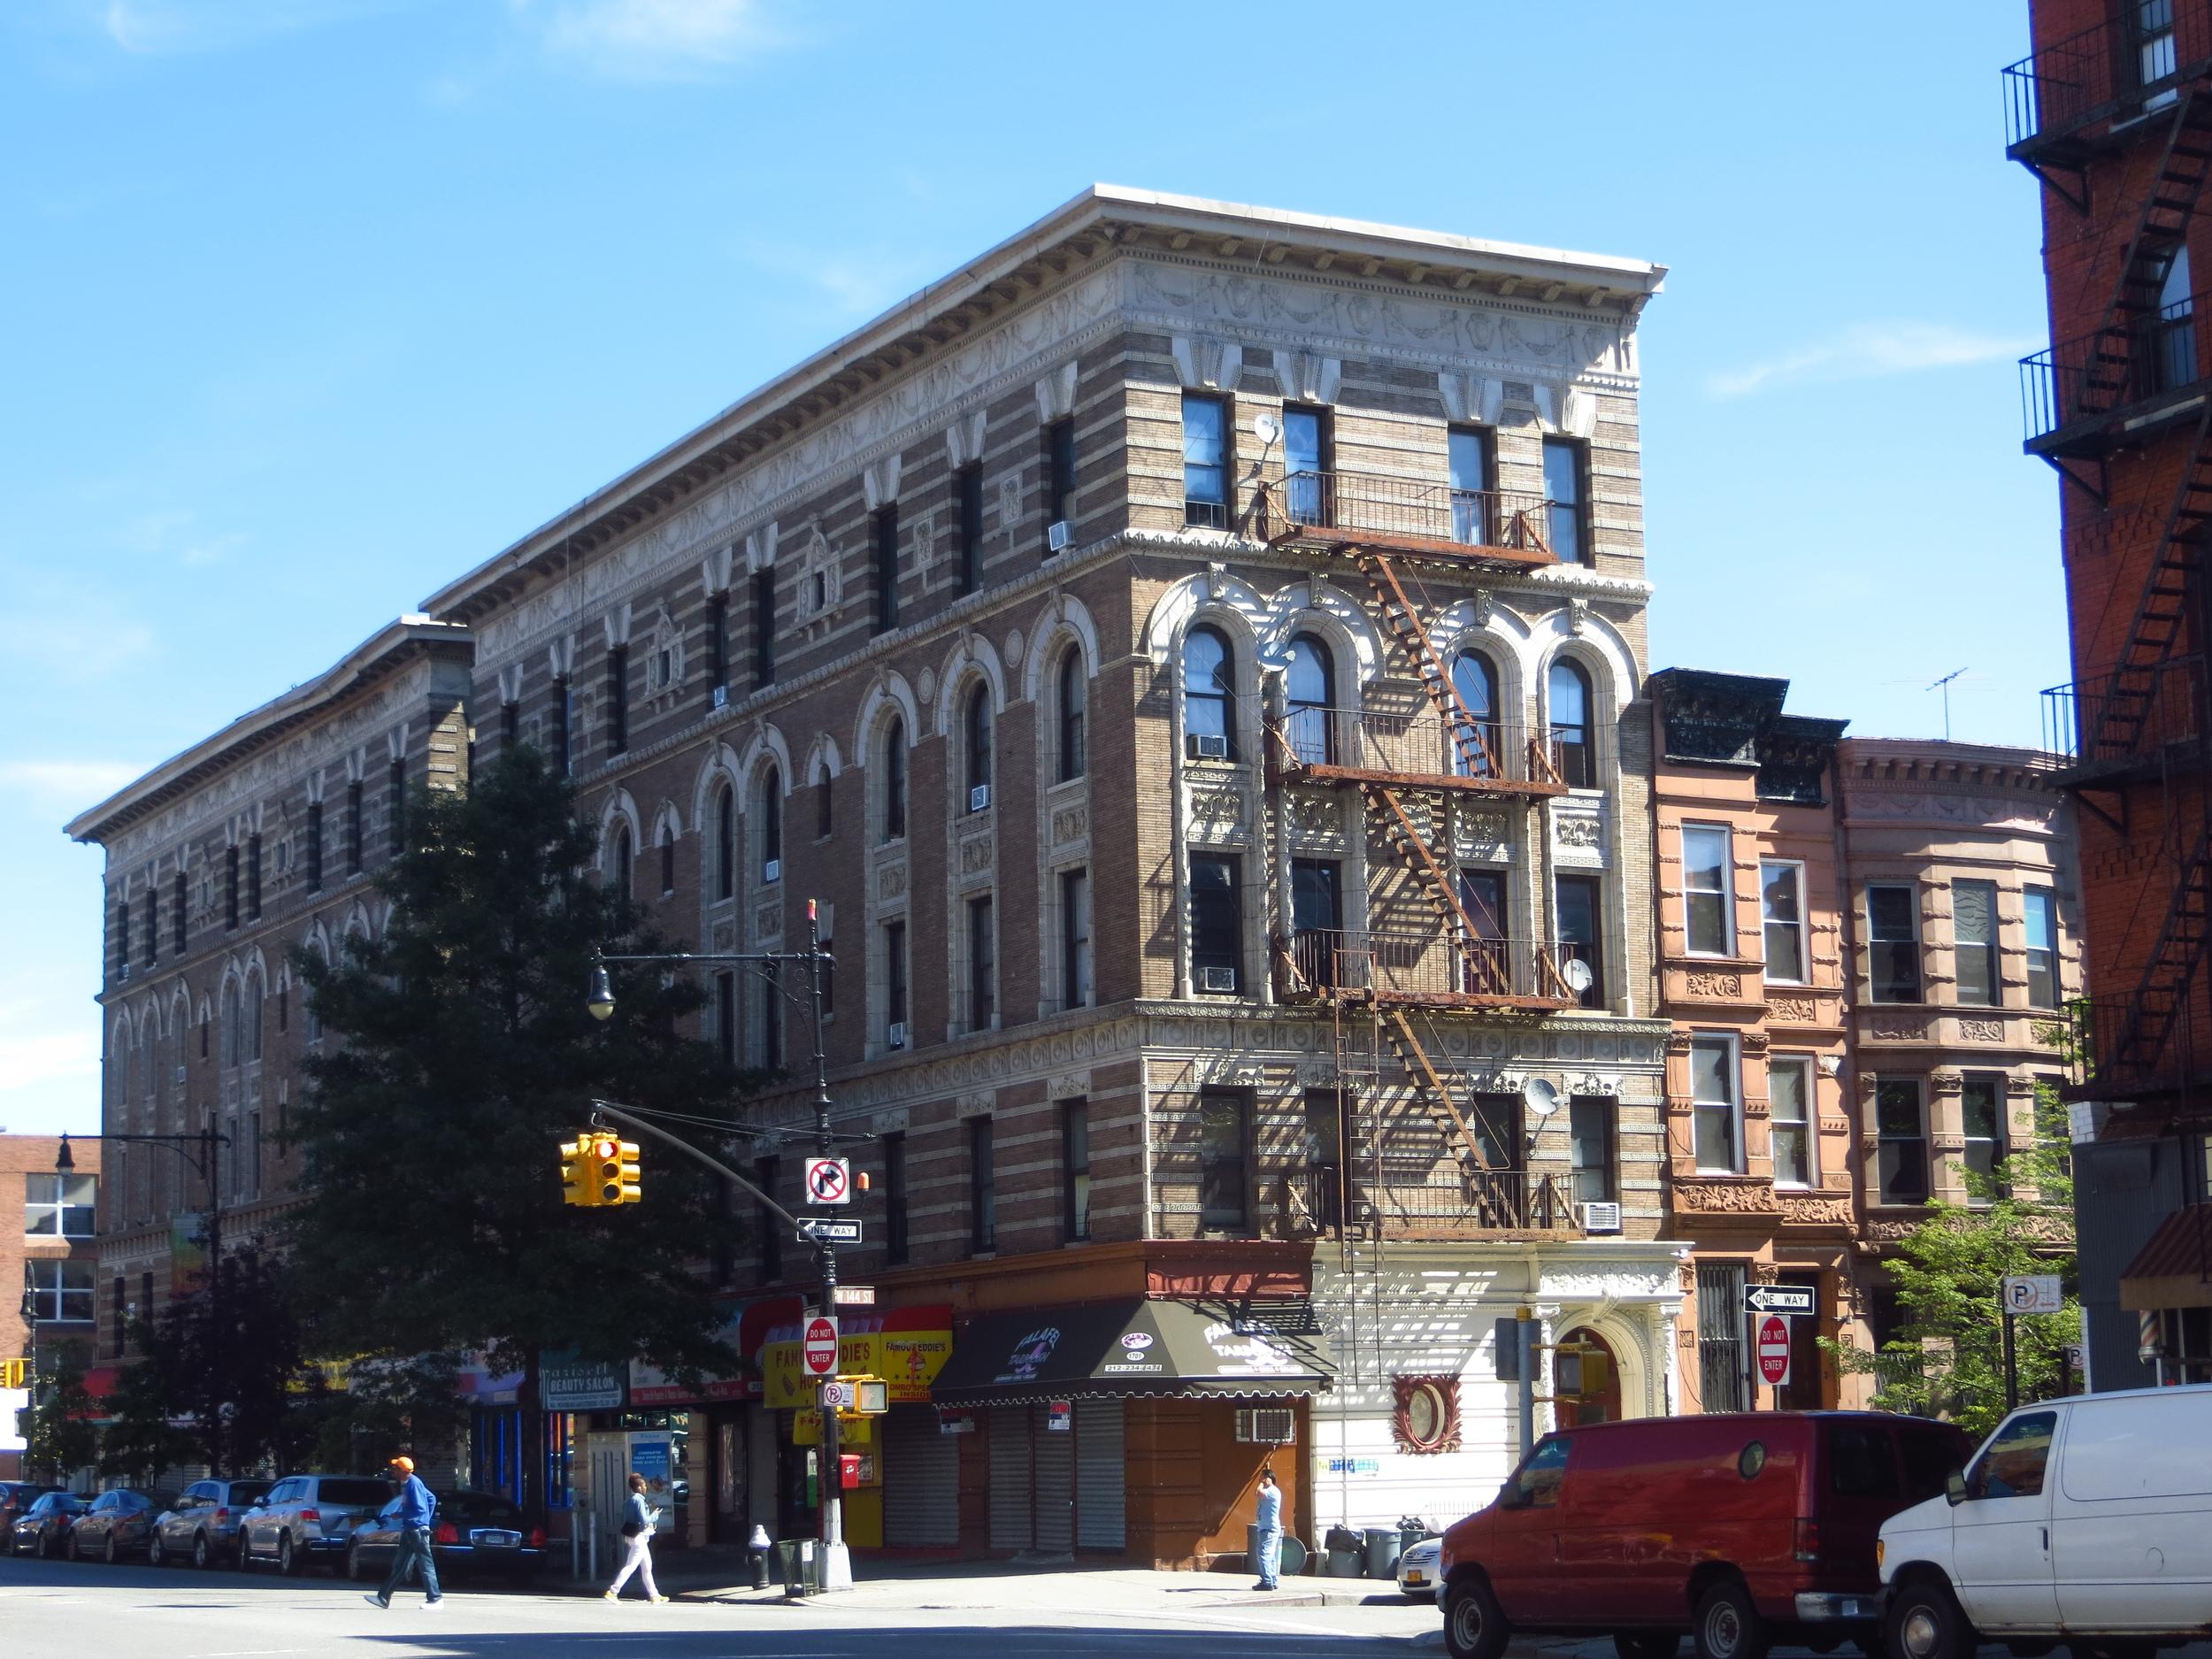 Harlem intersection